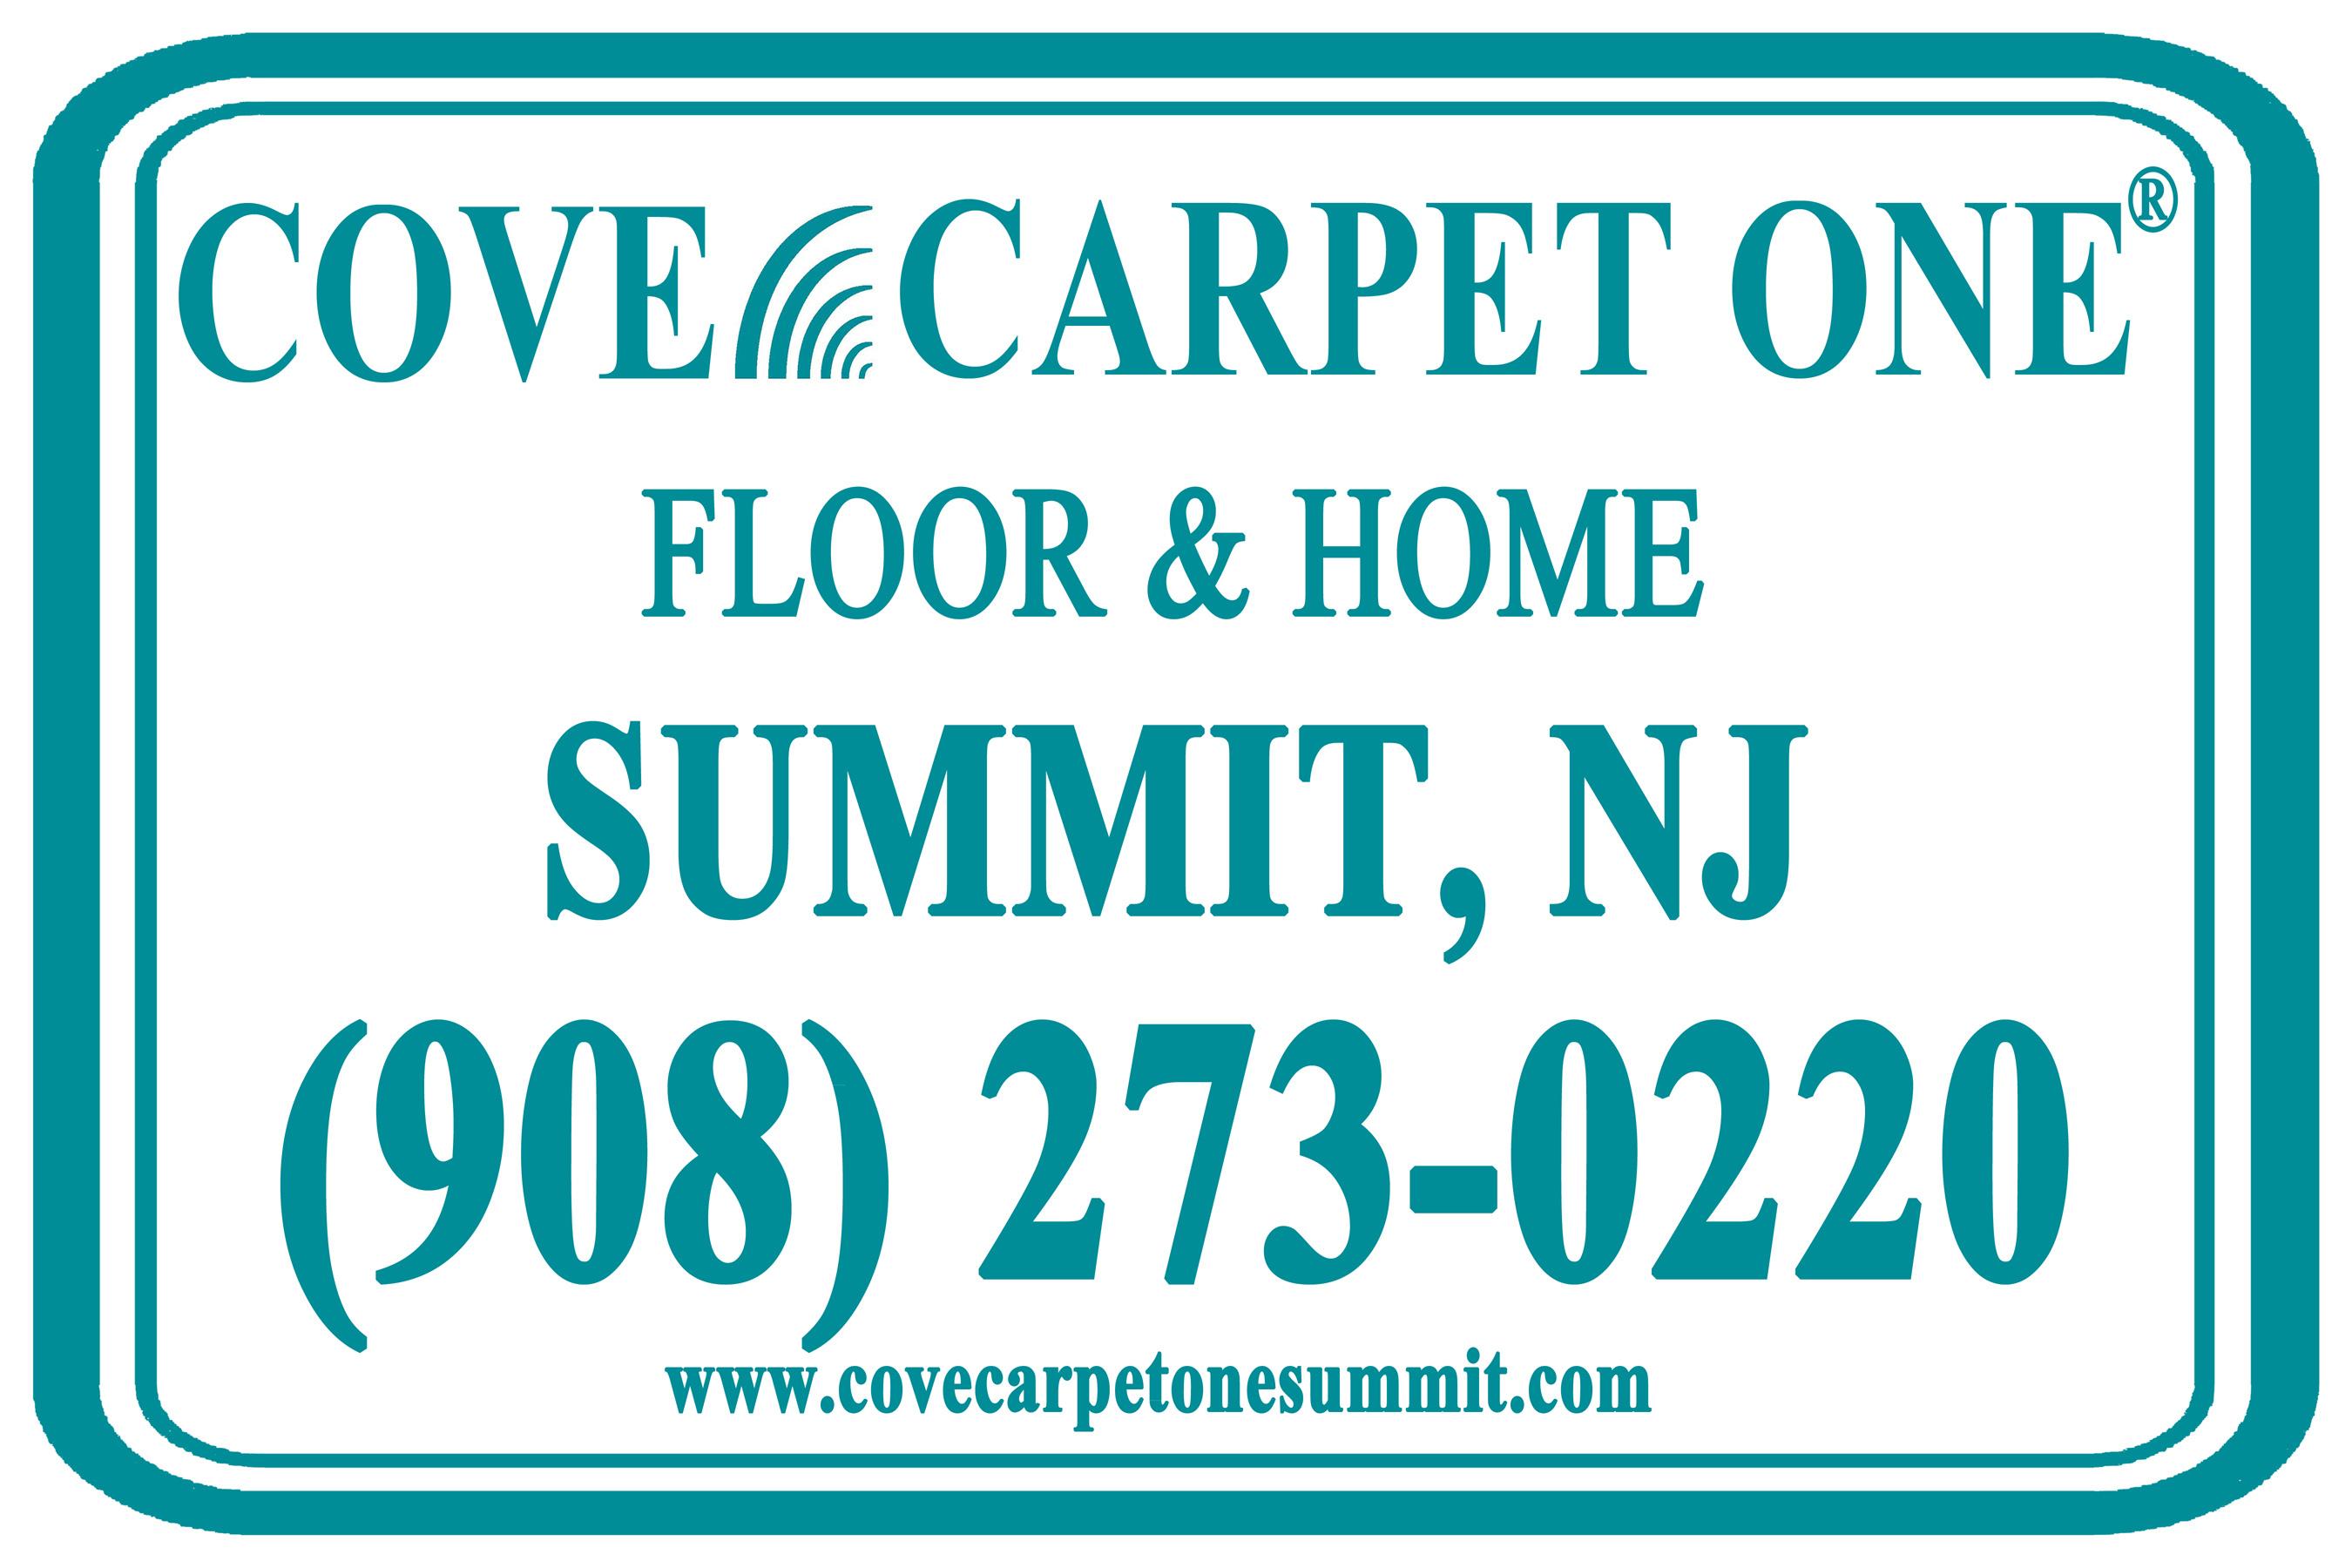 181bf72f8d9df74000f4_Cove_Logo.jpg